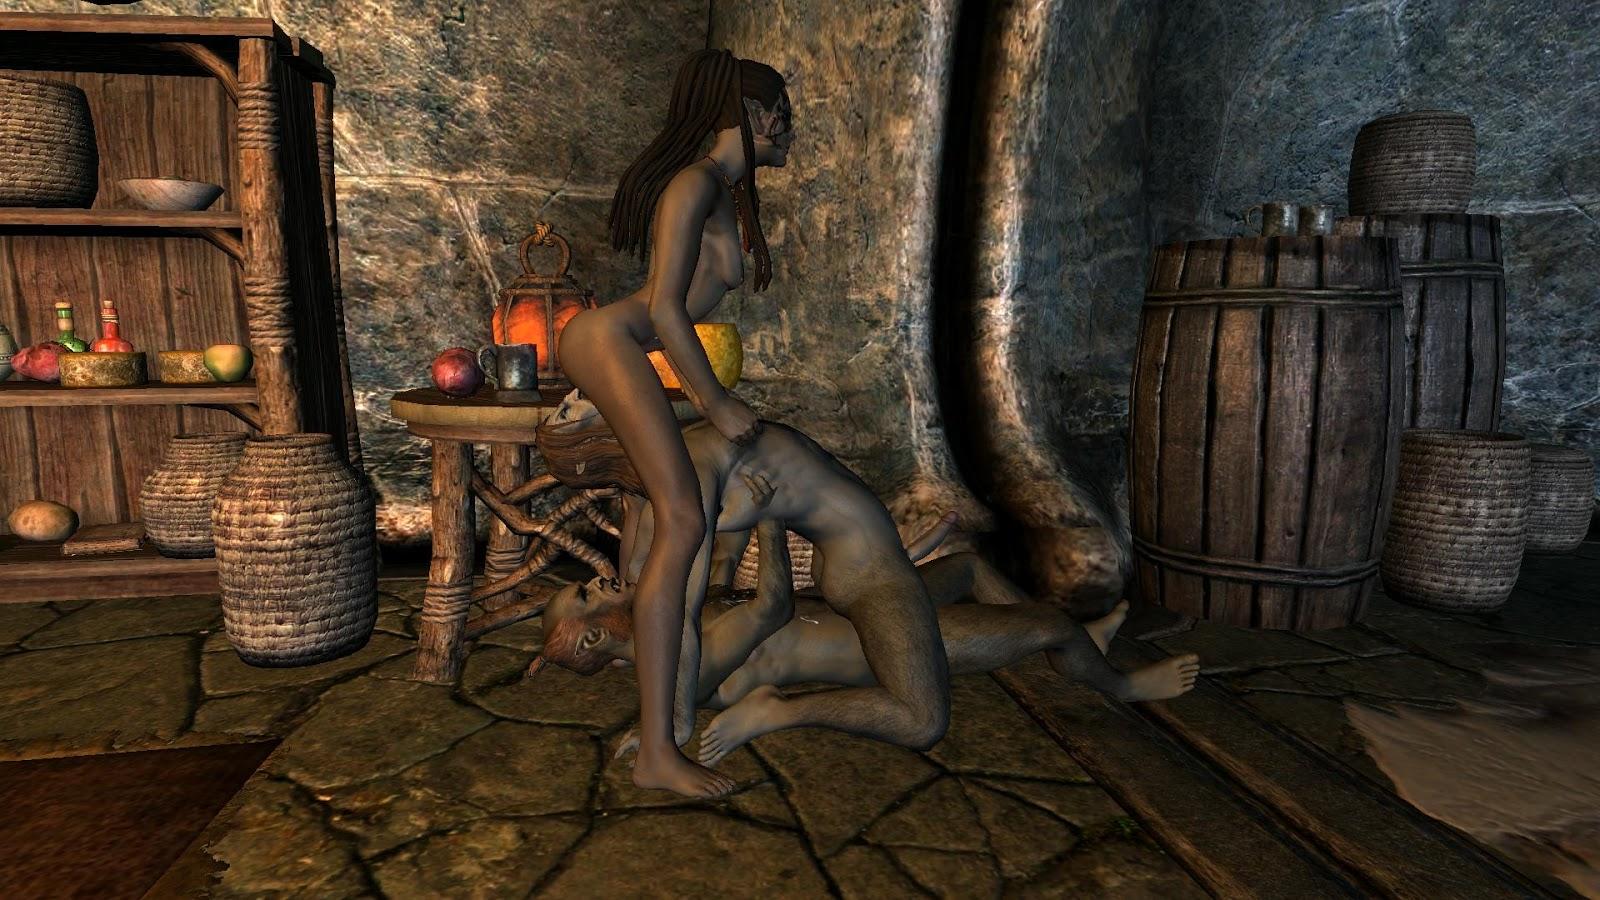 Xxx giris fucking images 3d nude movies